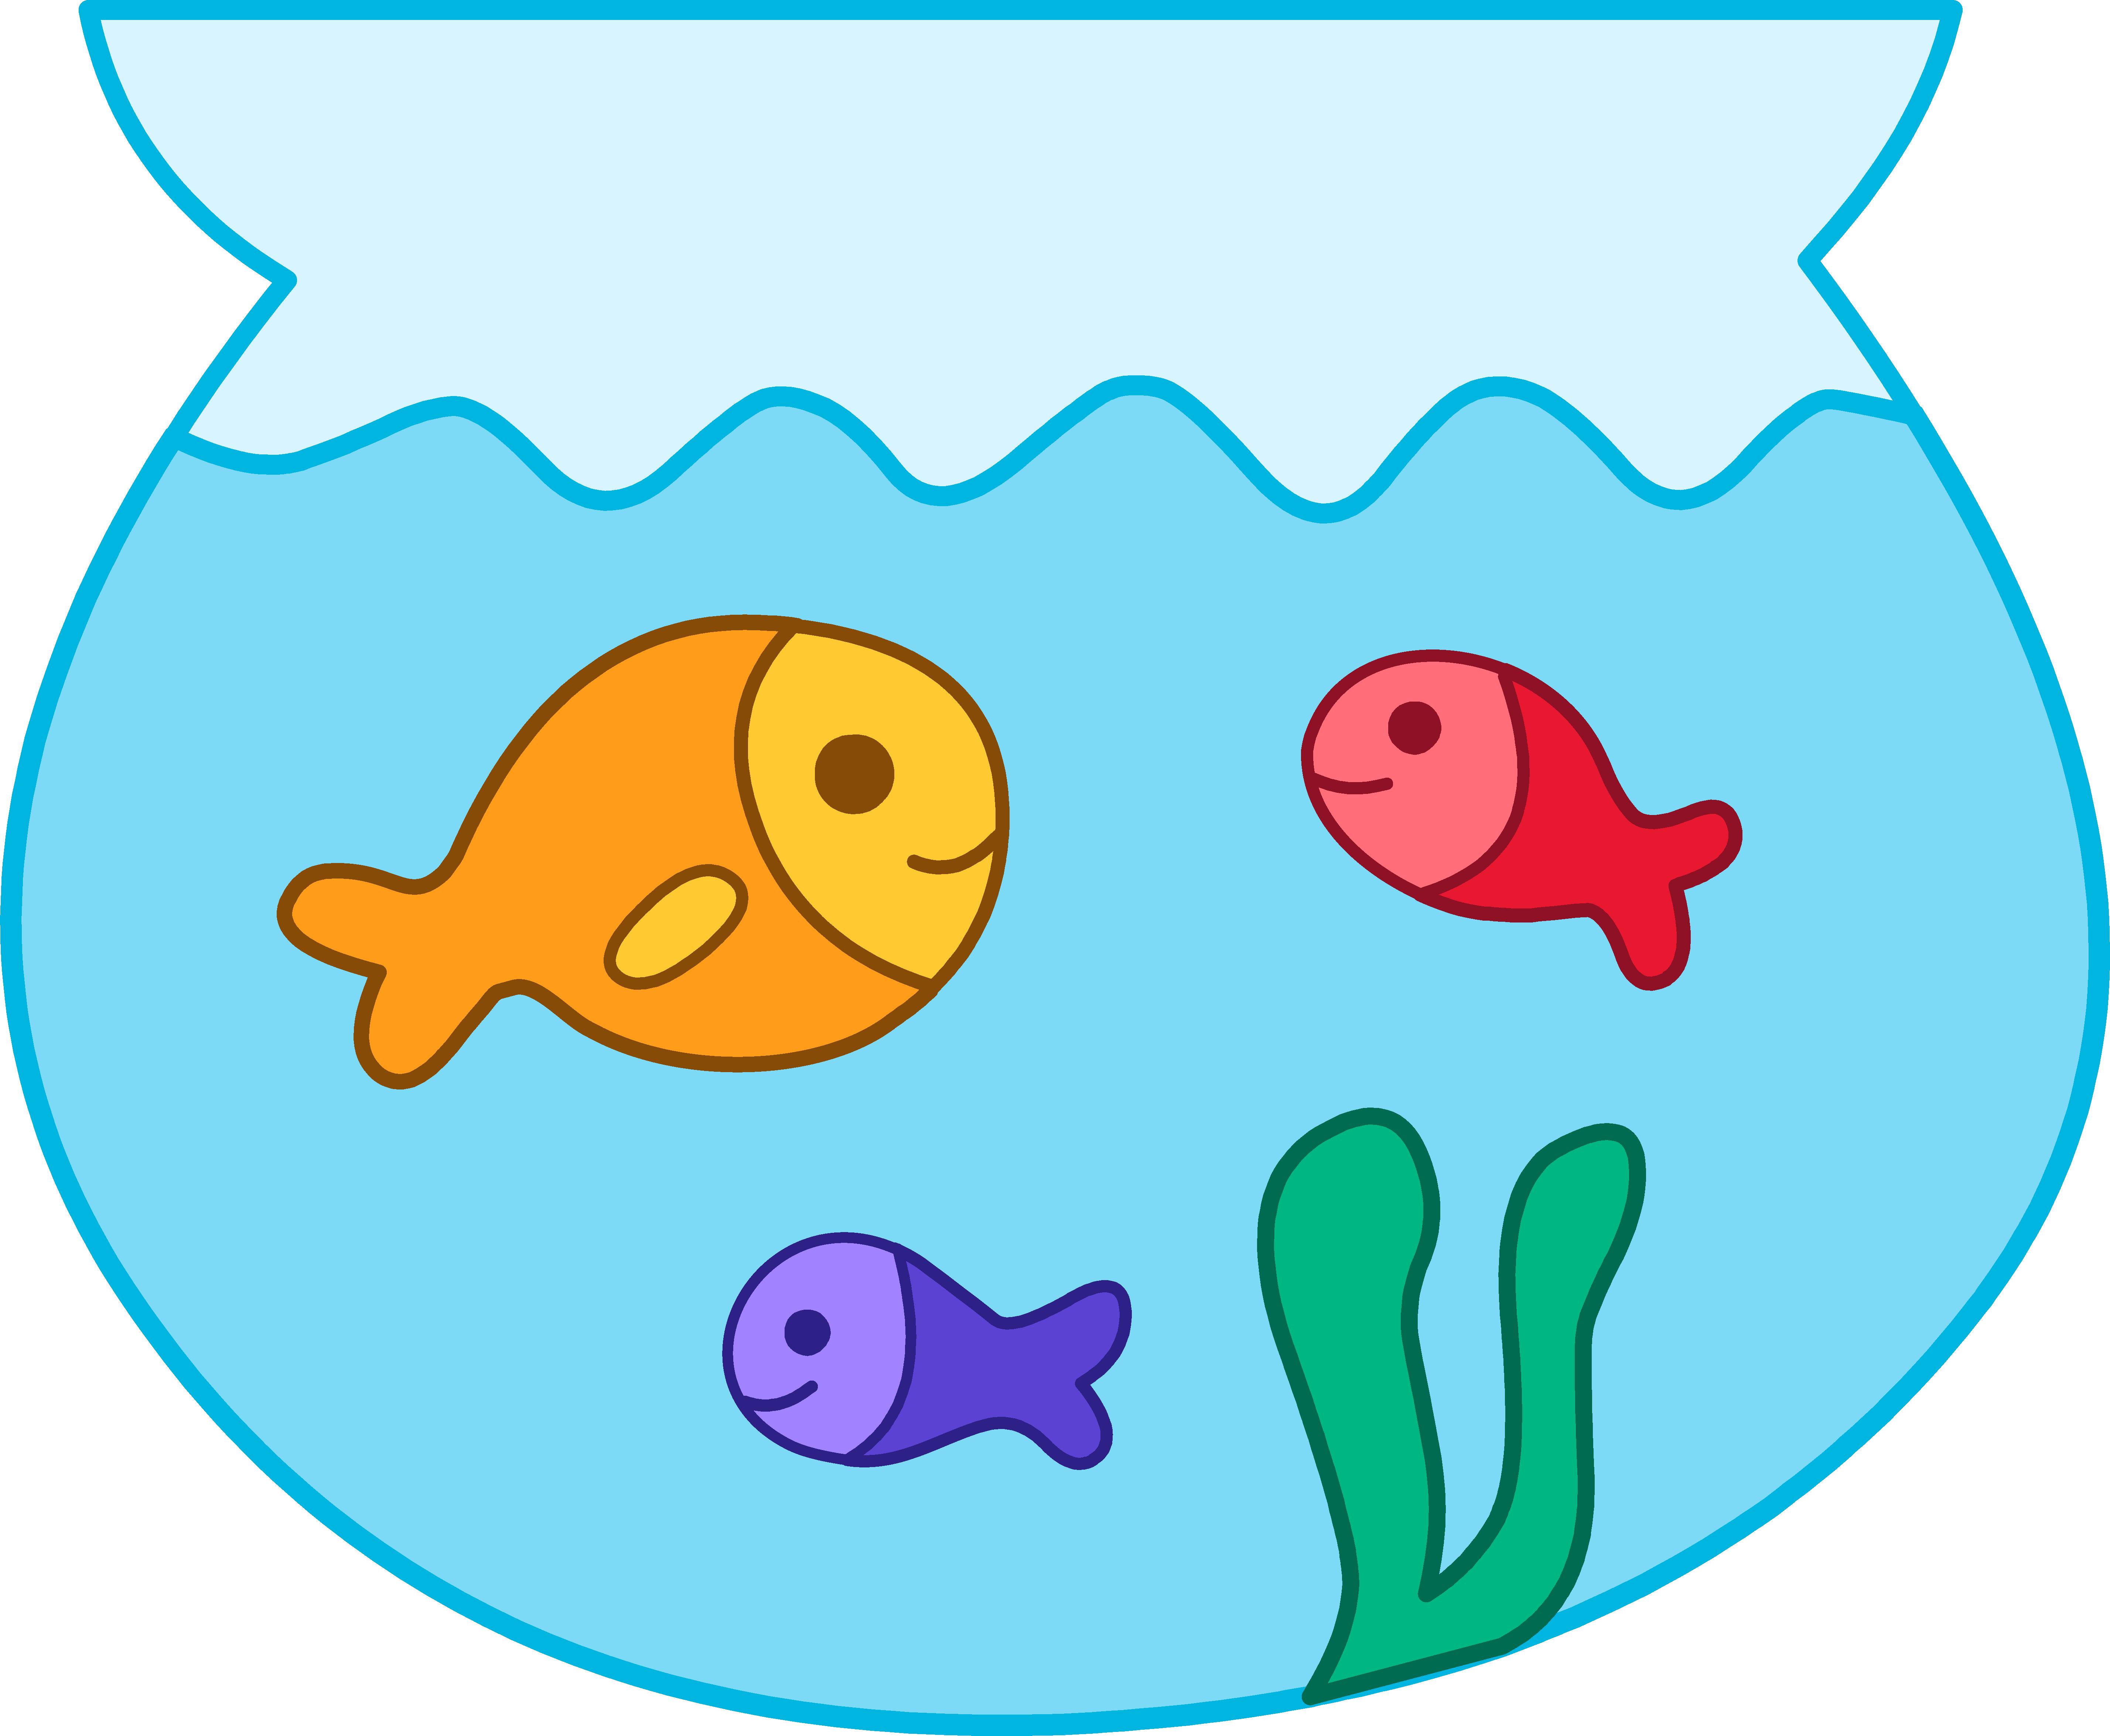 Fishbowl clipart pet fish. Fishes cute png pixels